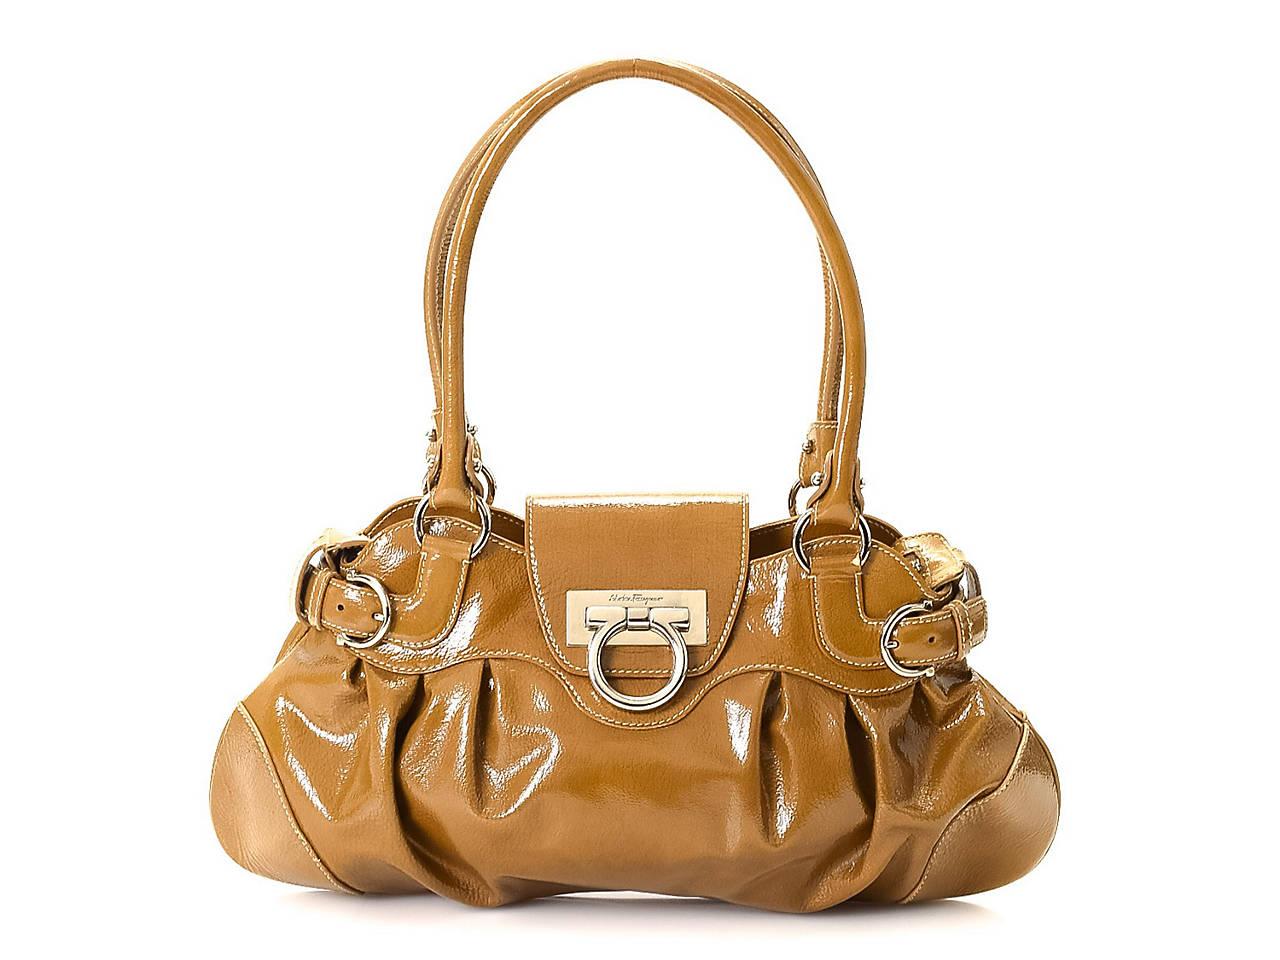 76afce55e3 Salvatore Ferragamo - Vintage Luxury Marisa Leather Shoulder Bag ...